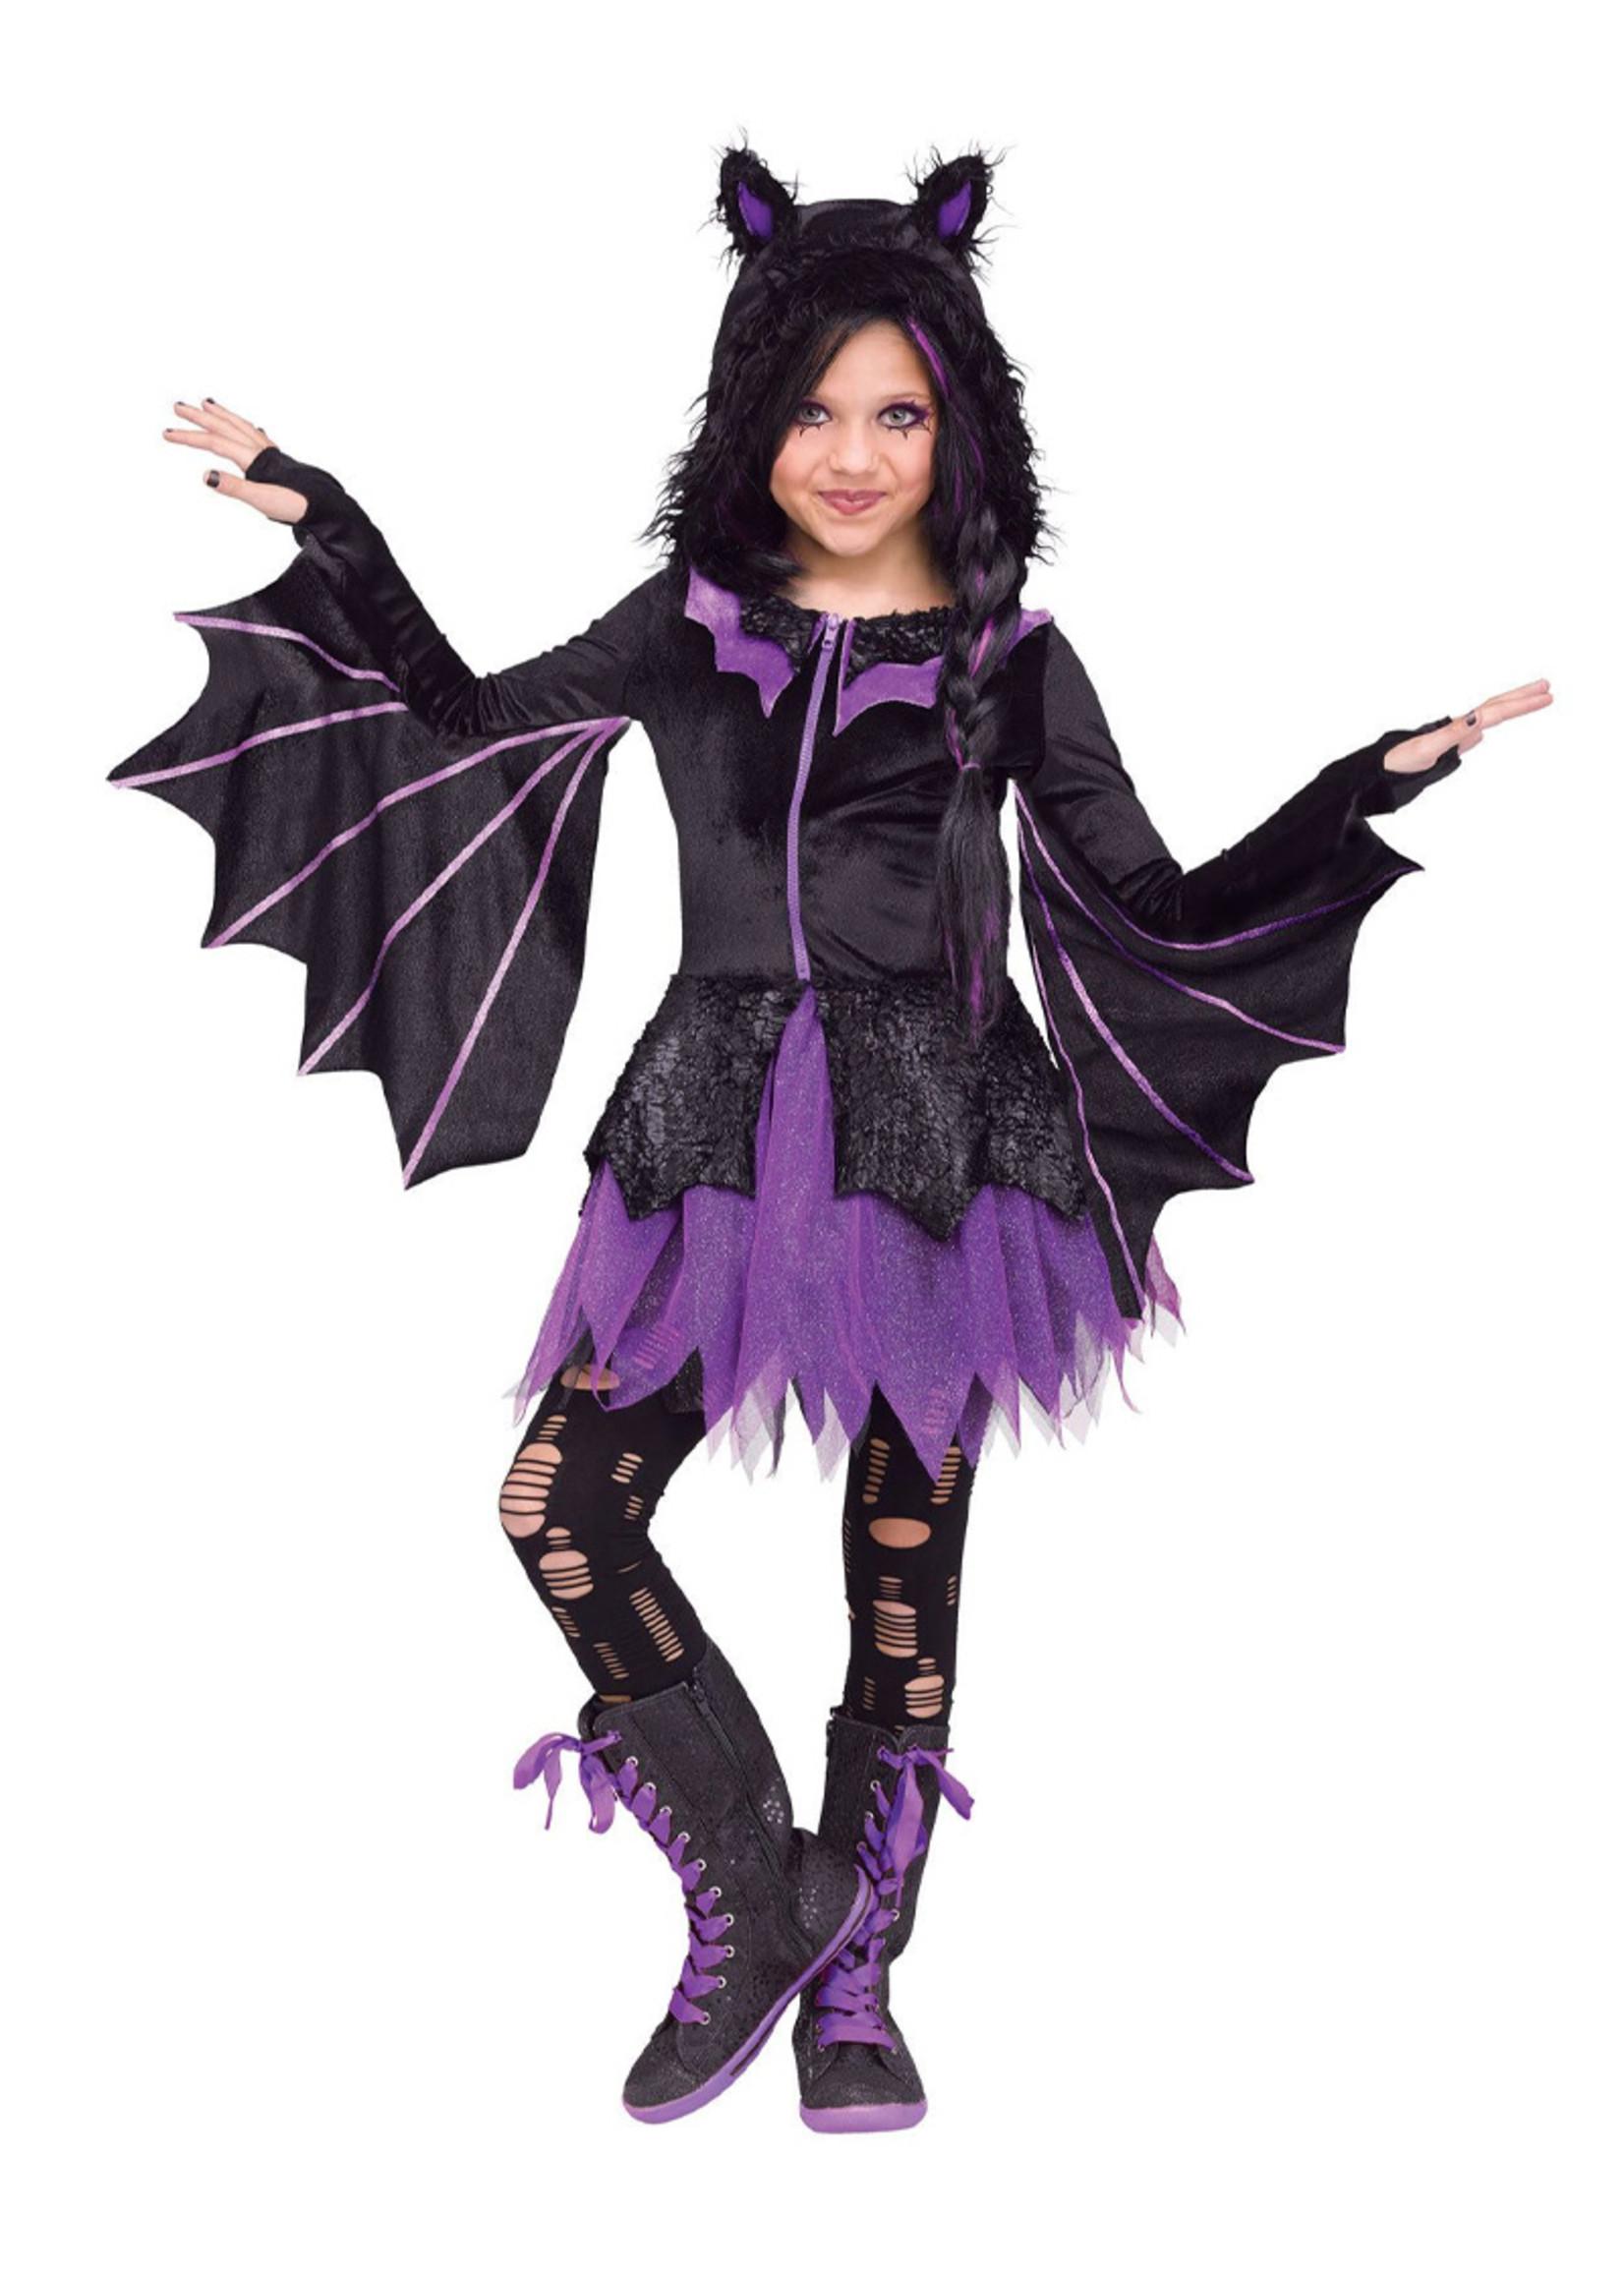 Night Flyer Costume - Girls